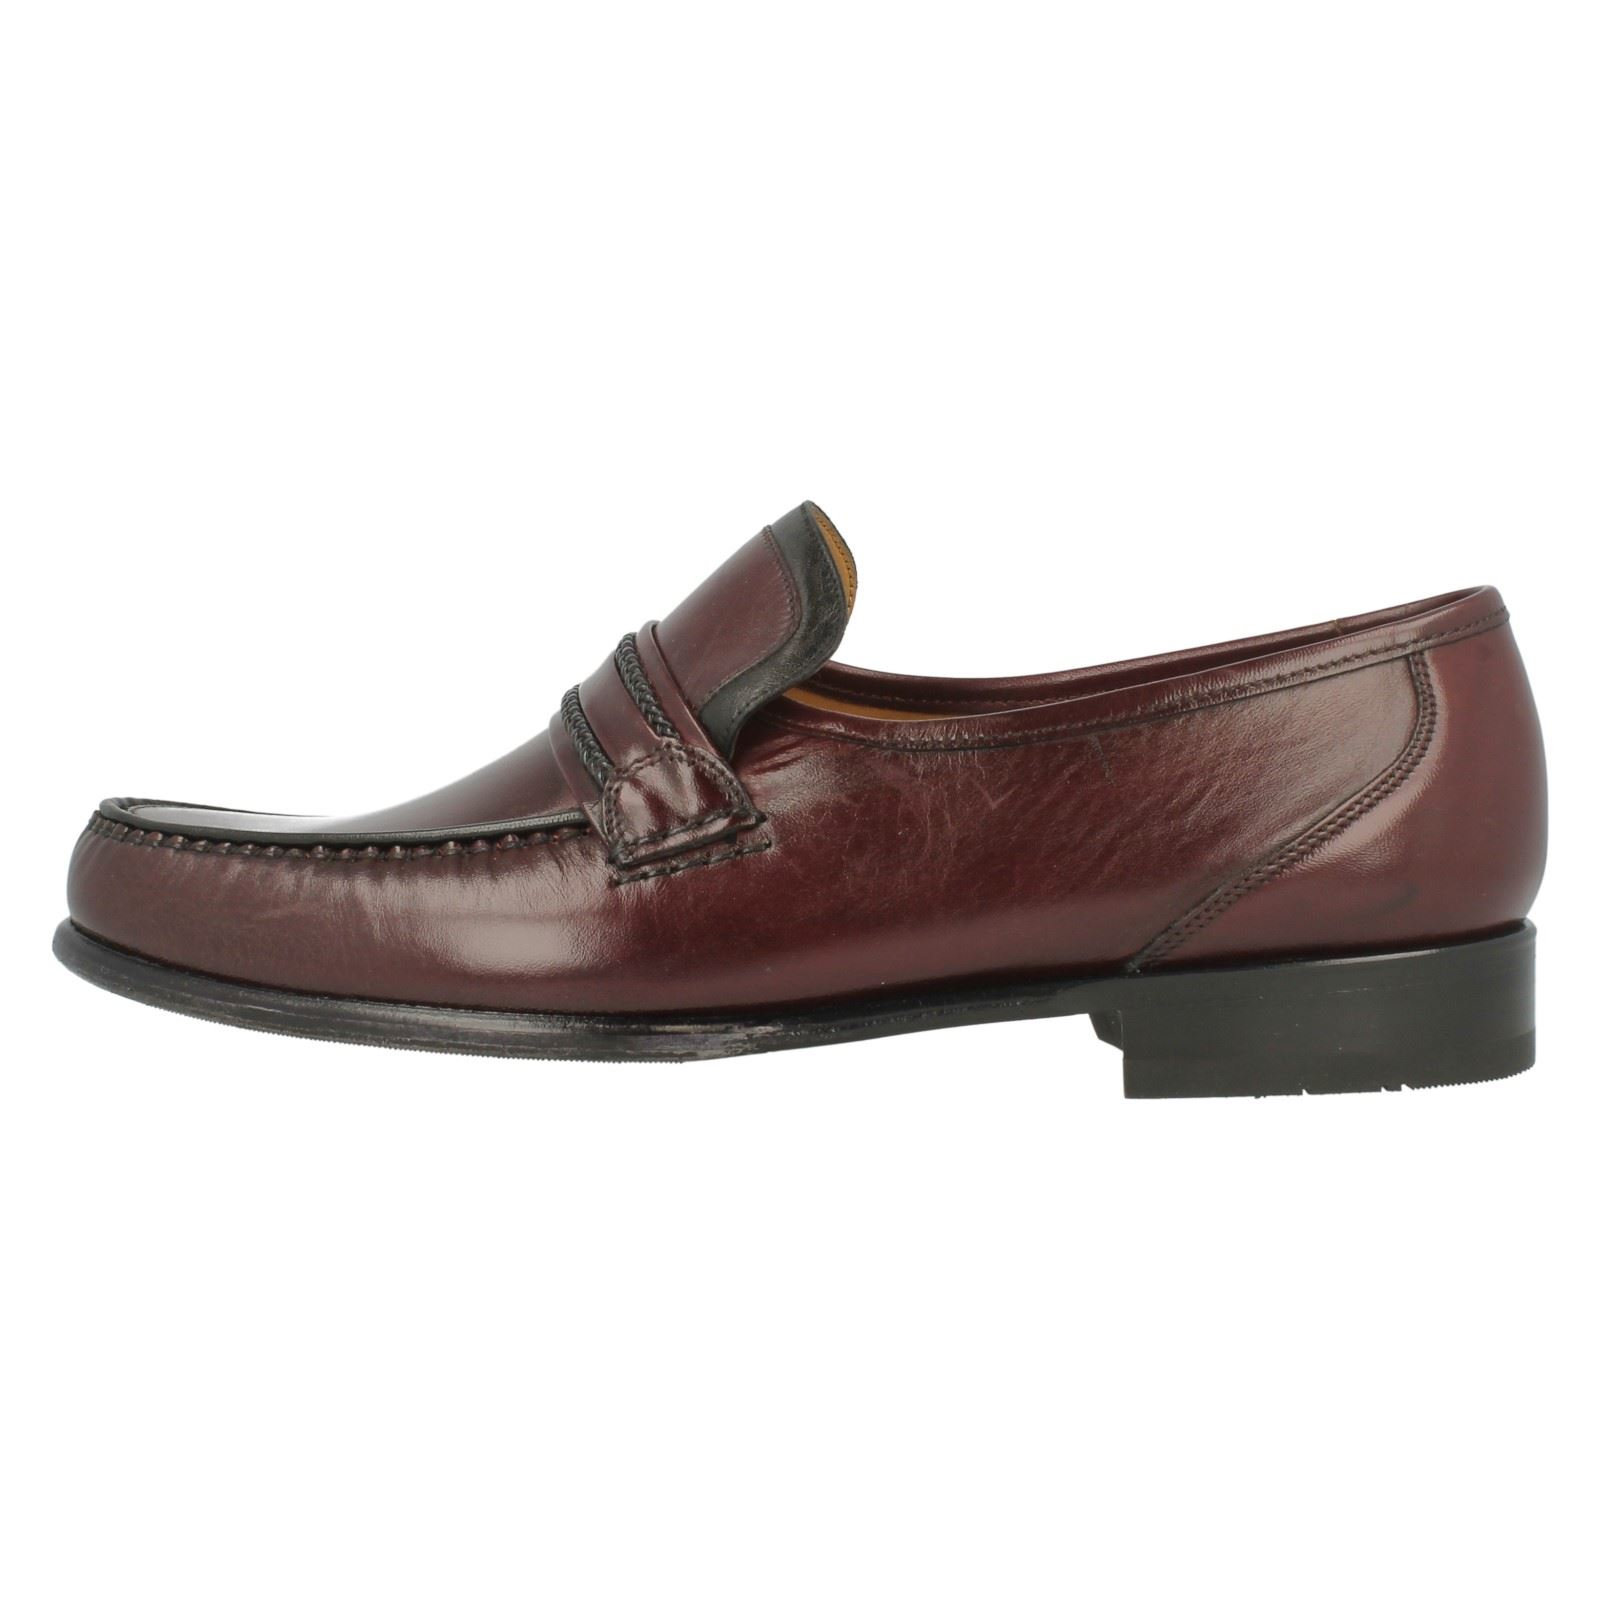 Mens Loake Shoes Rome